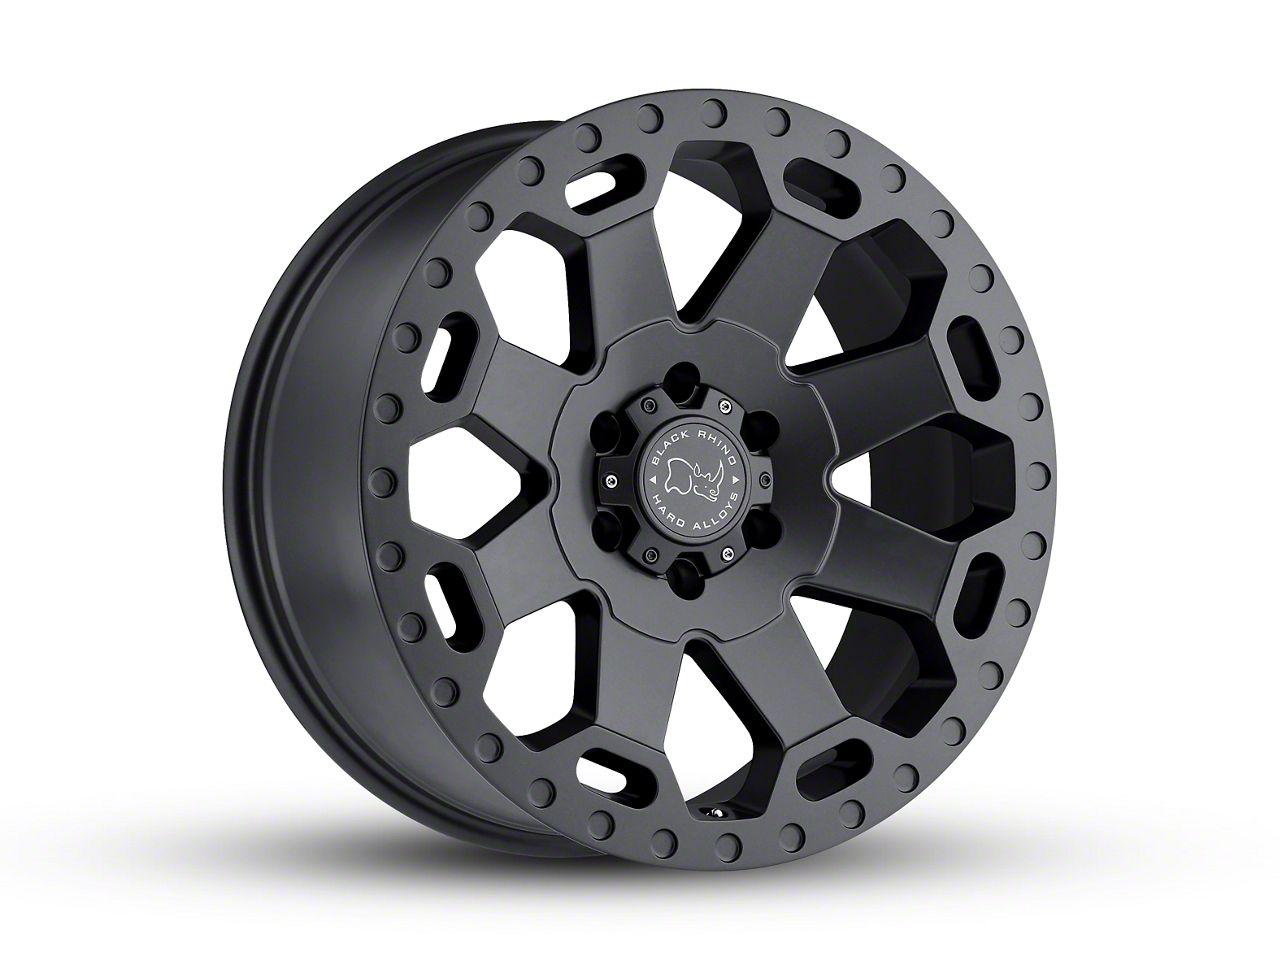 Black Rhino Warlord Matte Gunmetal 6-Lug Wheel - 22x10 (04-18 F-150)